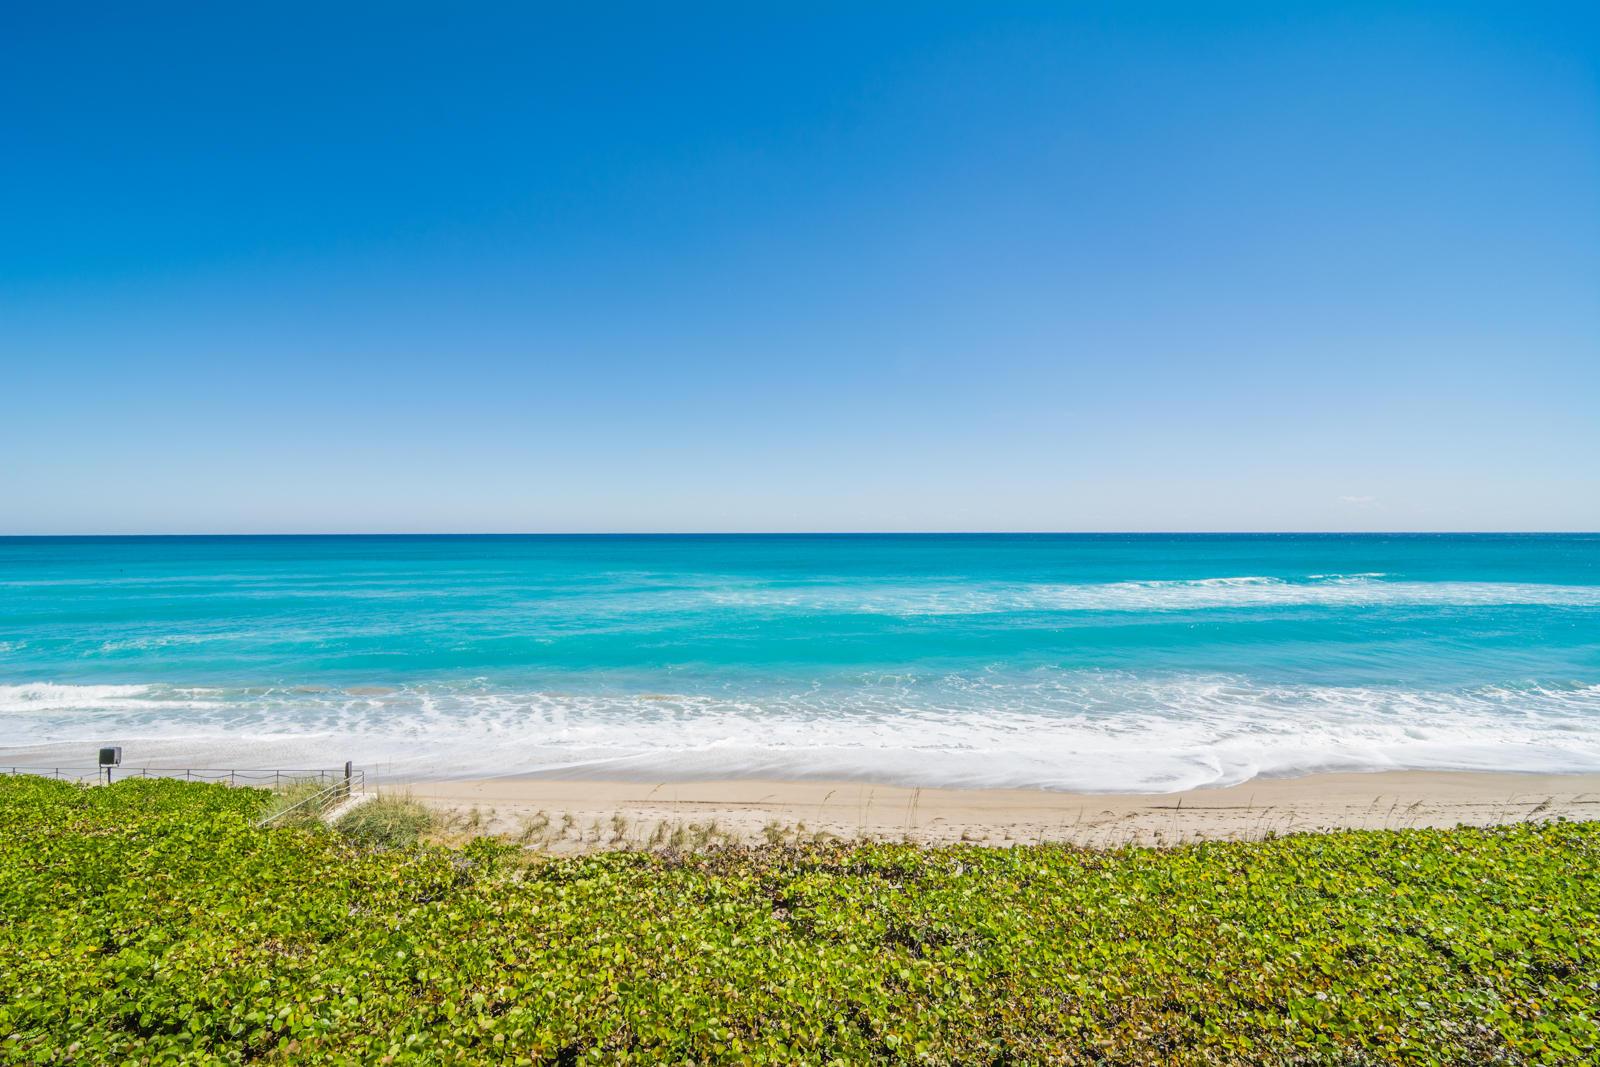 3170 S Ocean Boulevard, 202s - Palm Beach, Florida